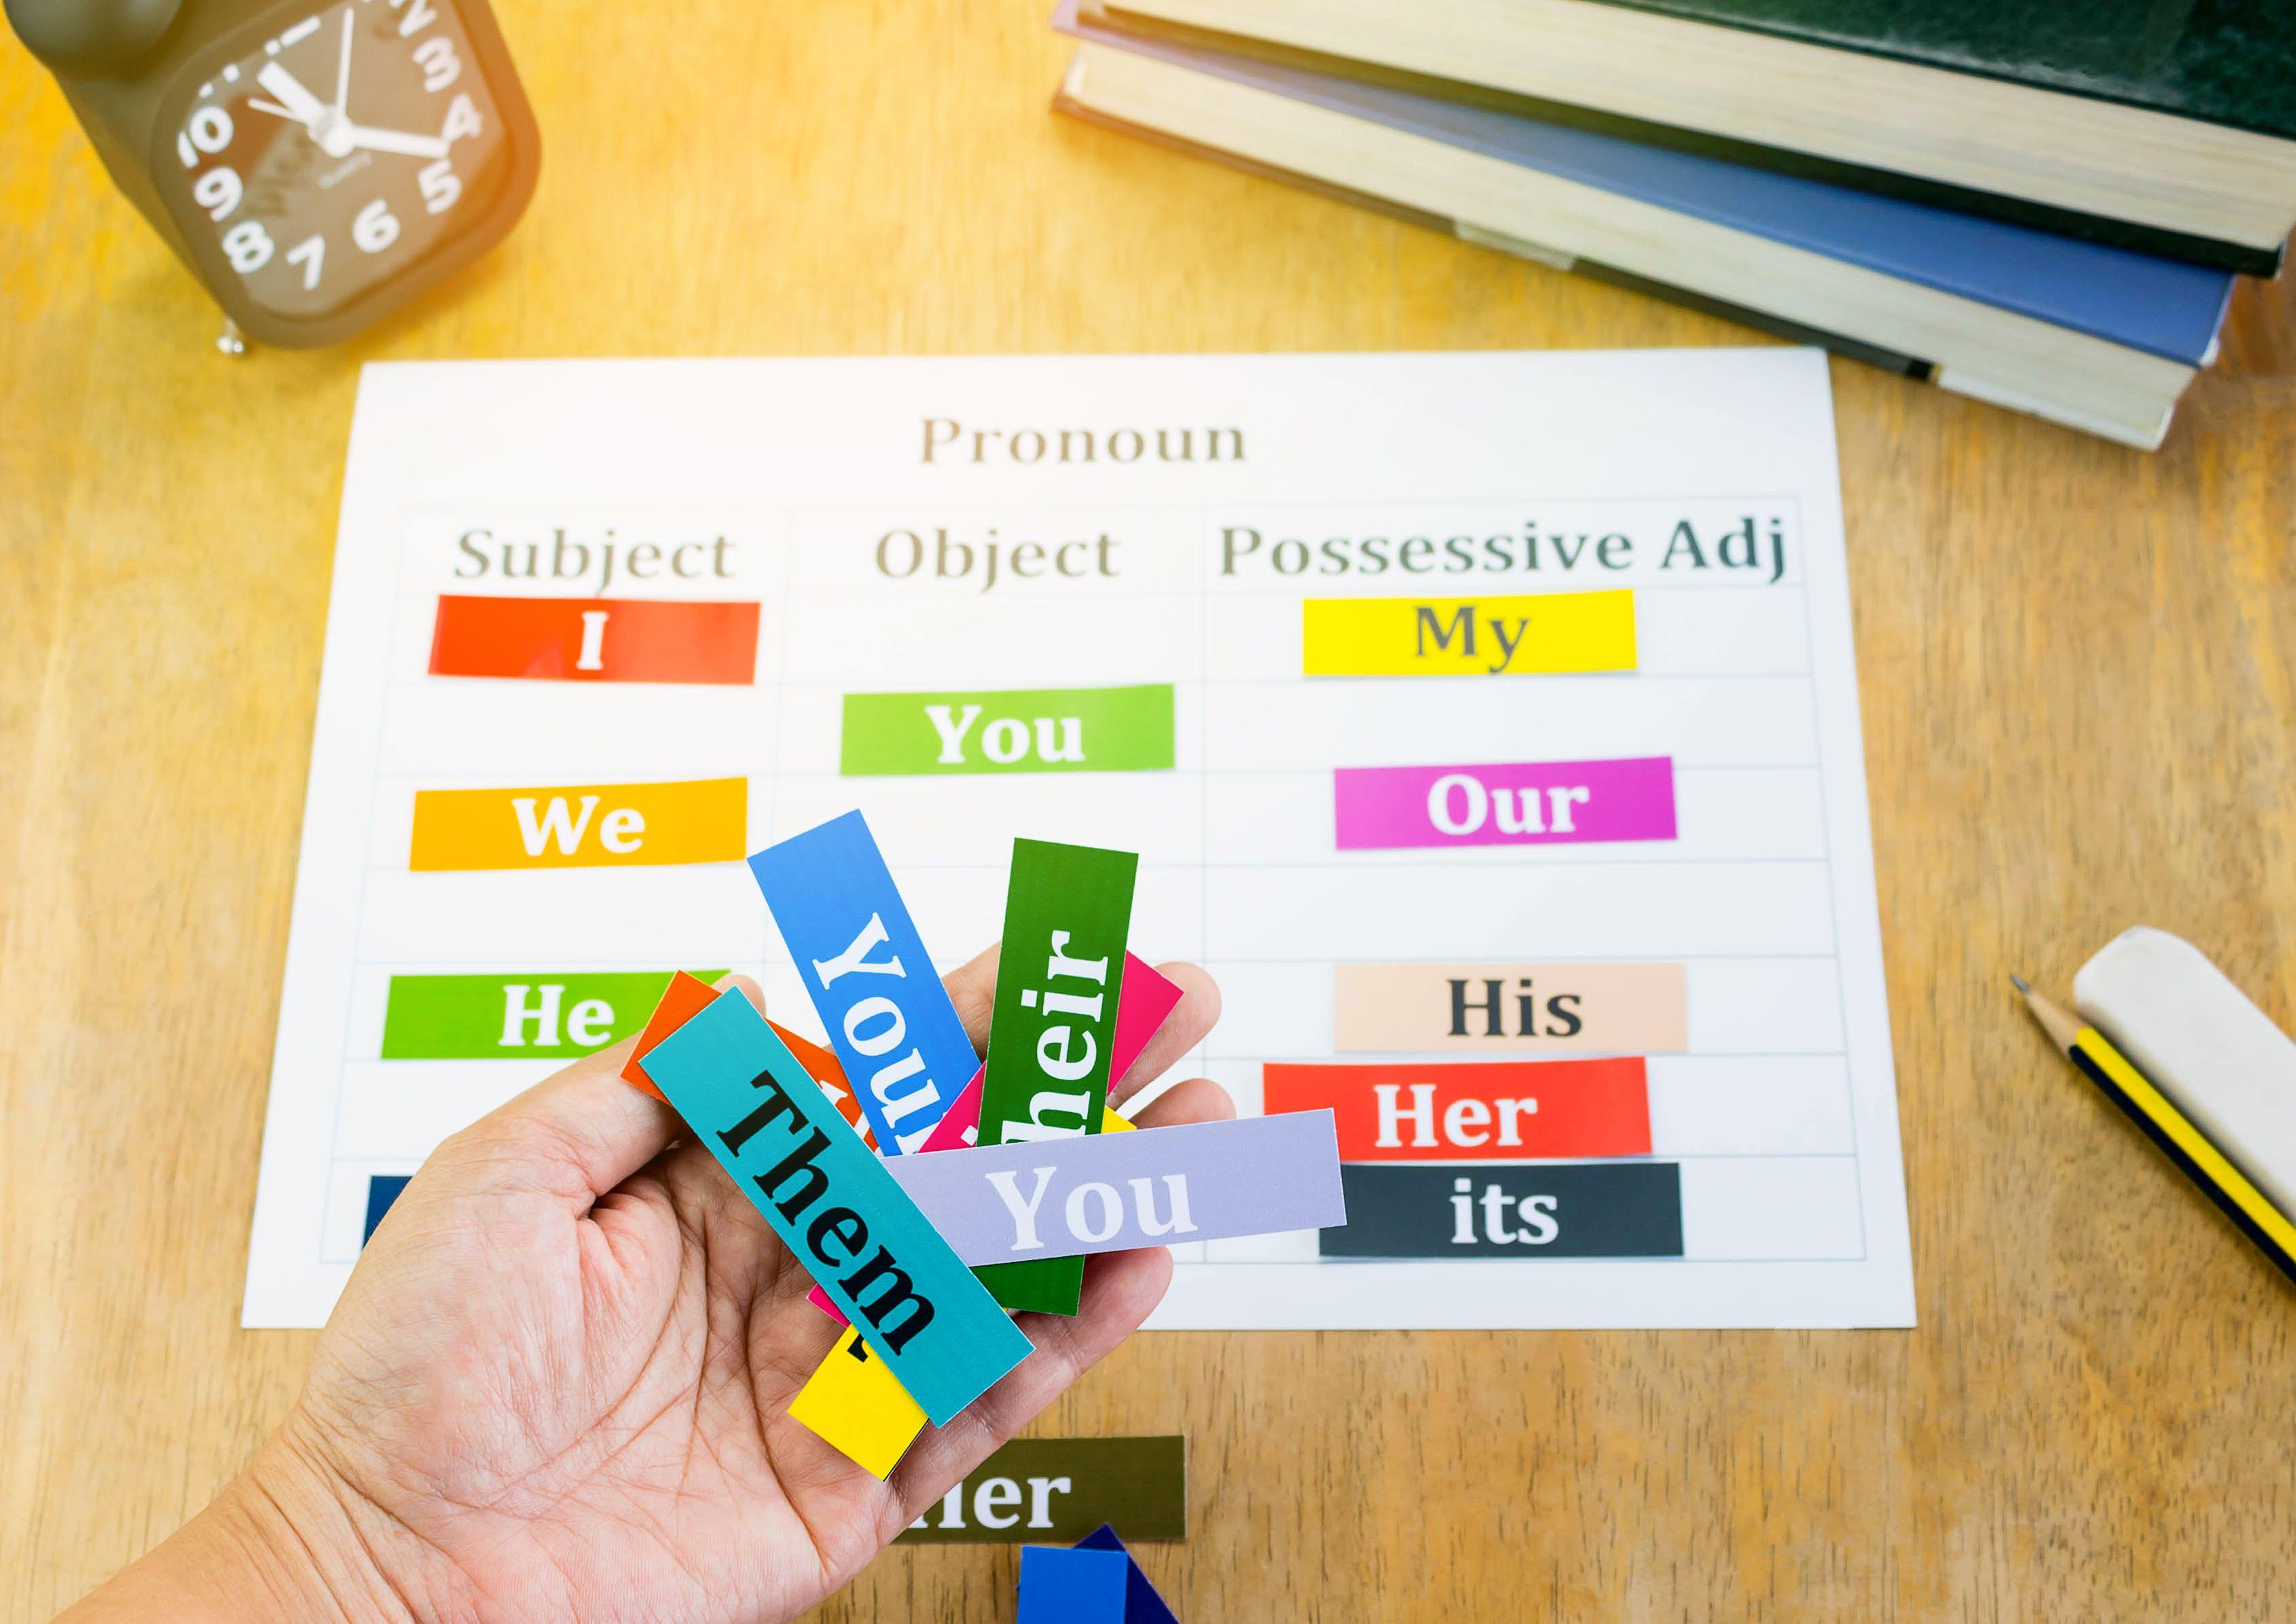 pronoun personal examples definition english pronouns worksheet grammar words getty myself fill